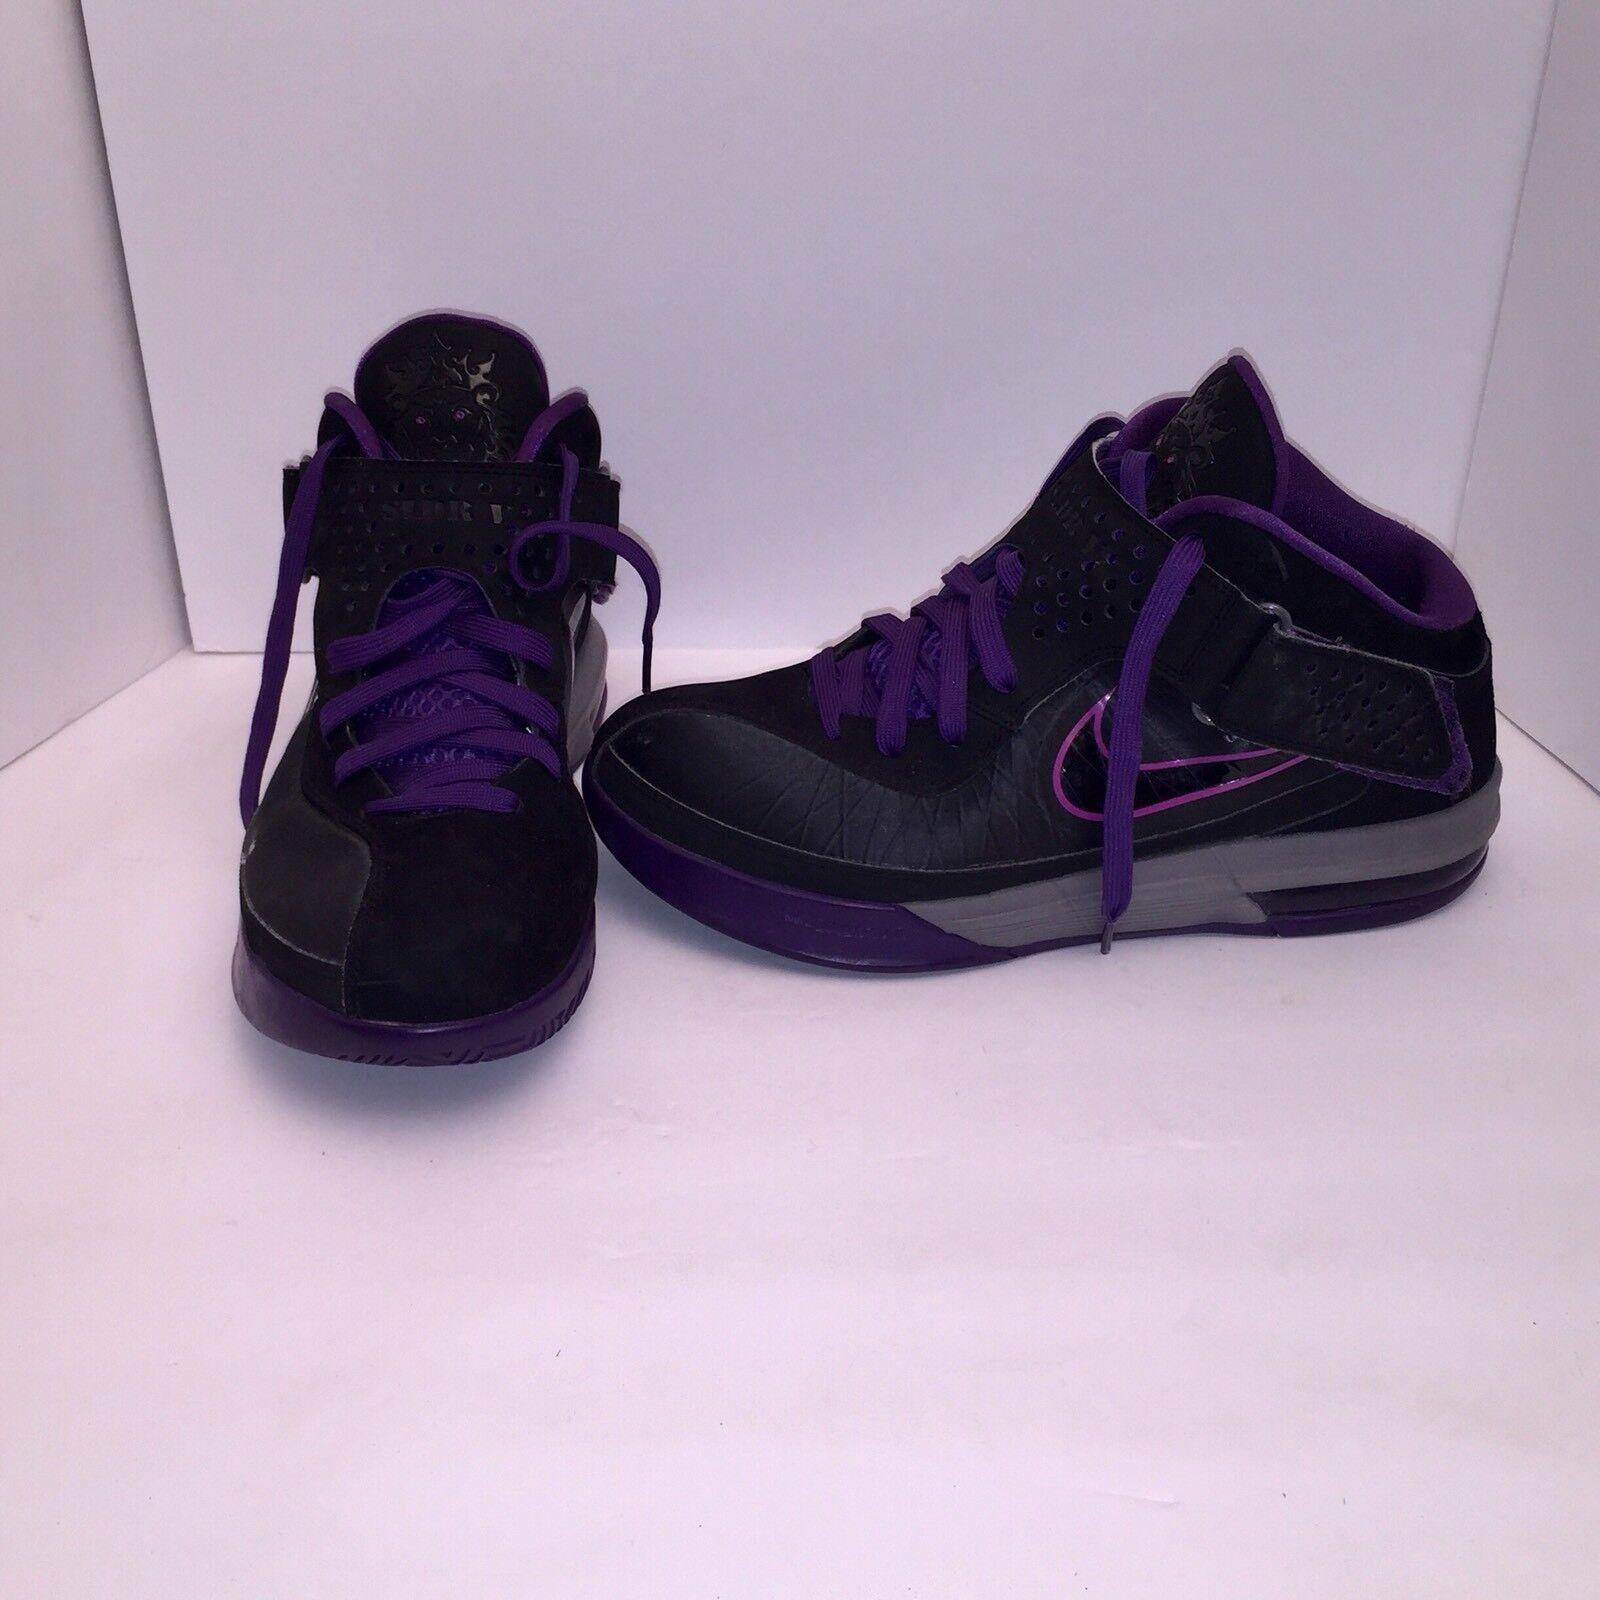 2018 Nike Lebron Air Max Soldier V 5 Black Purple Men's Sz 10.5